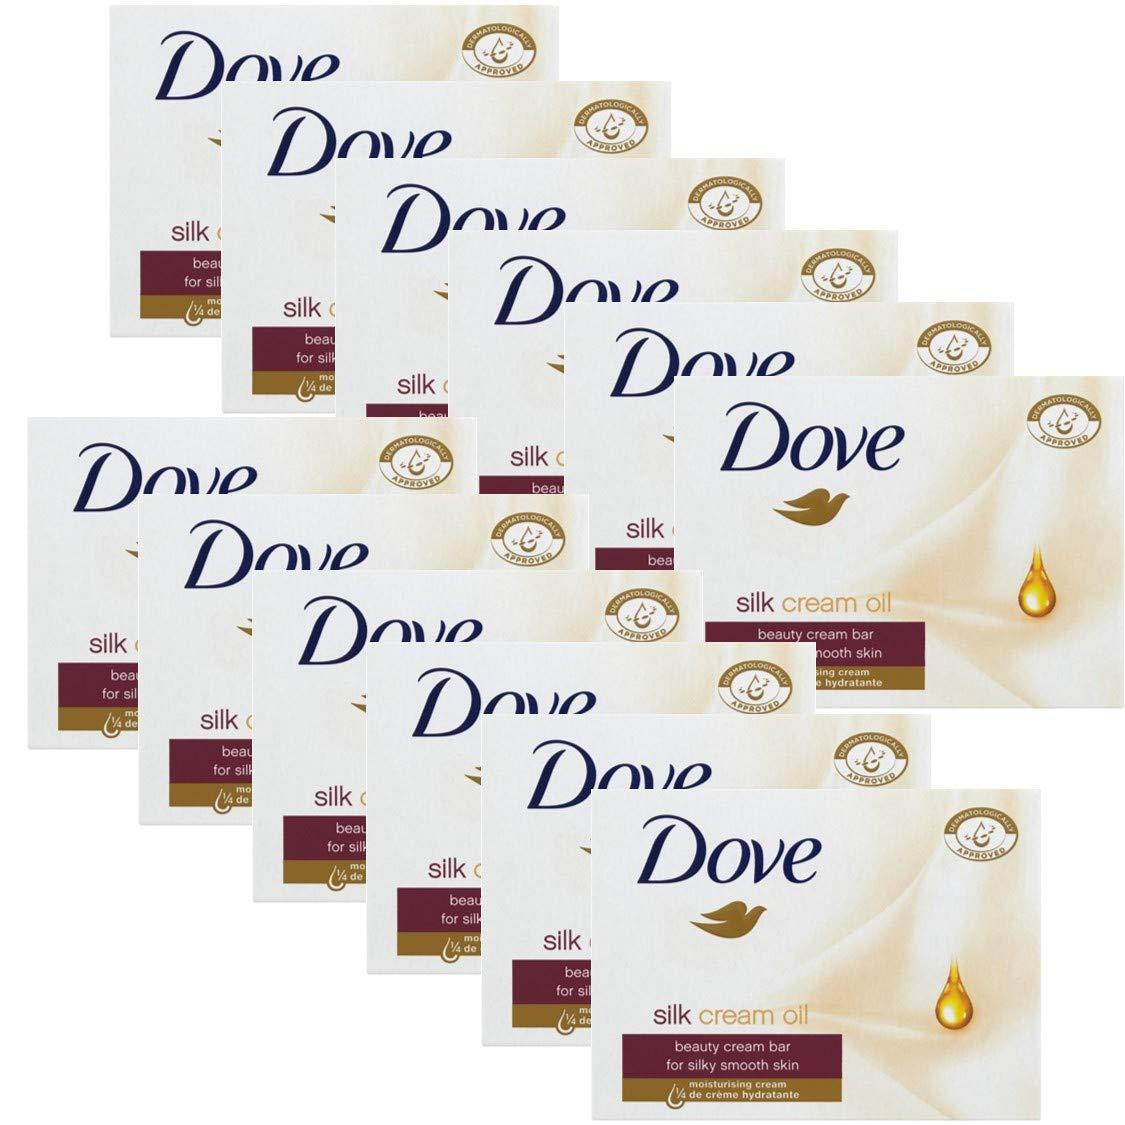 Dove Silk Cream Oil Beauty Cream Bar Soap, 3.5 Oz / 100 Gr (Pack of 12 Bars)